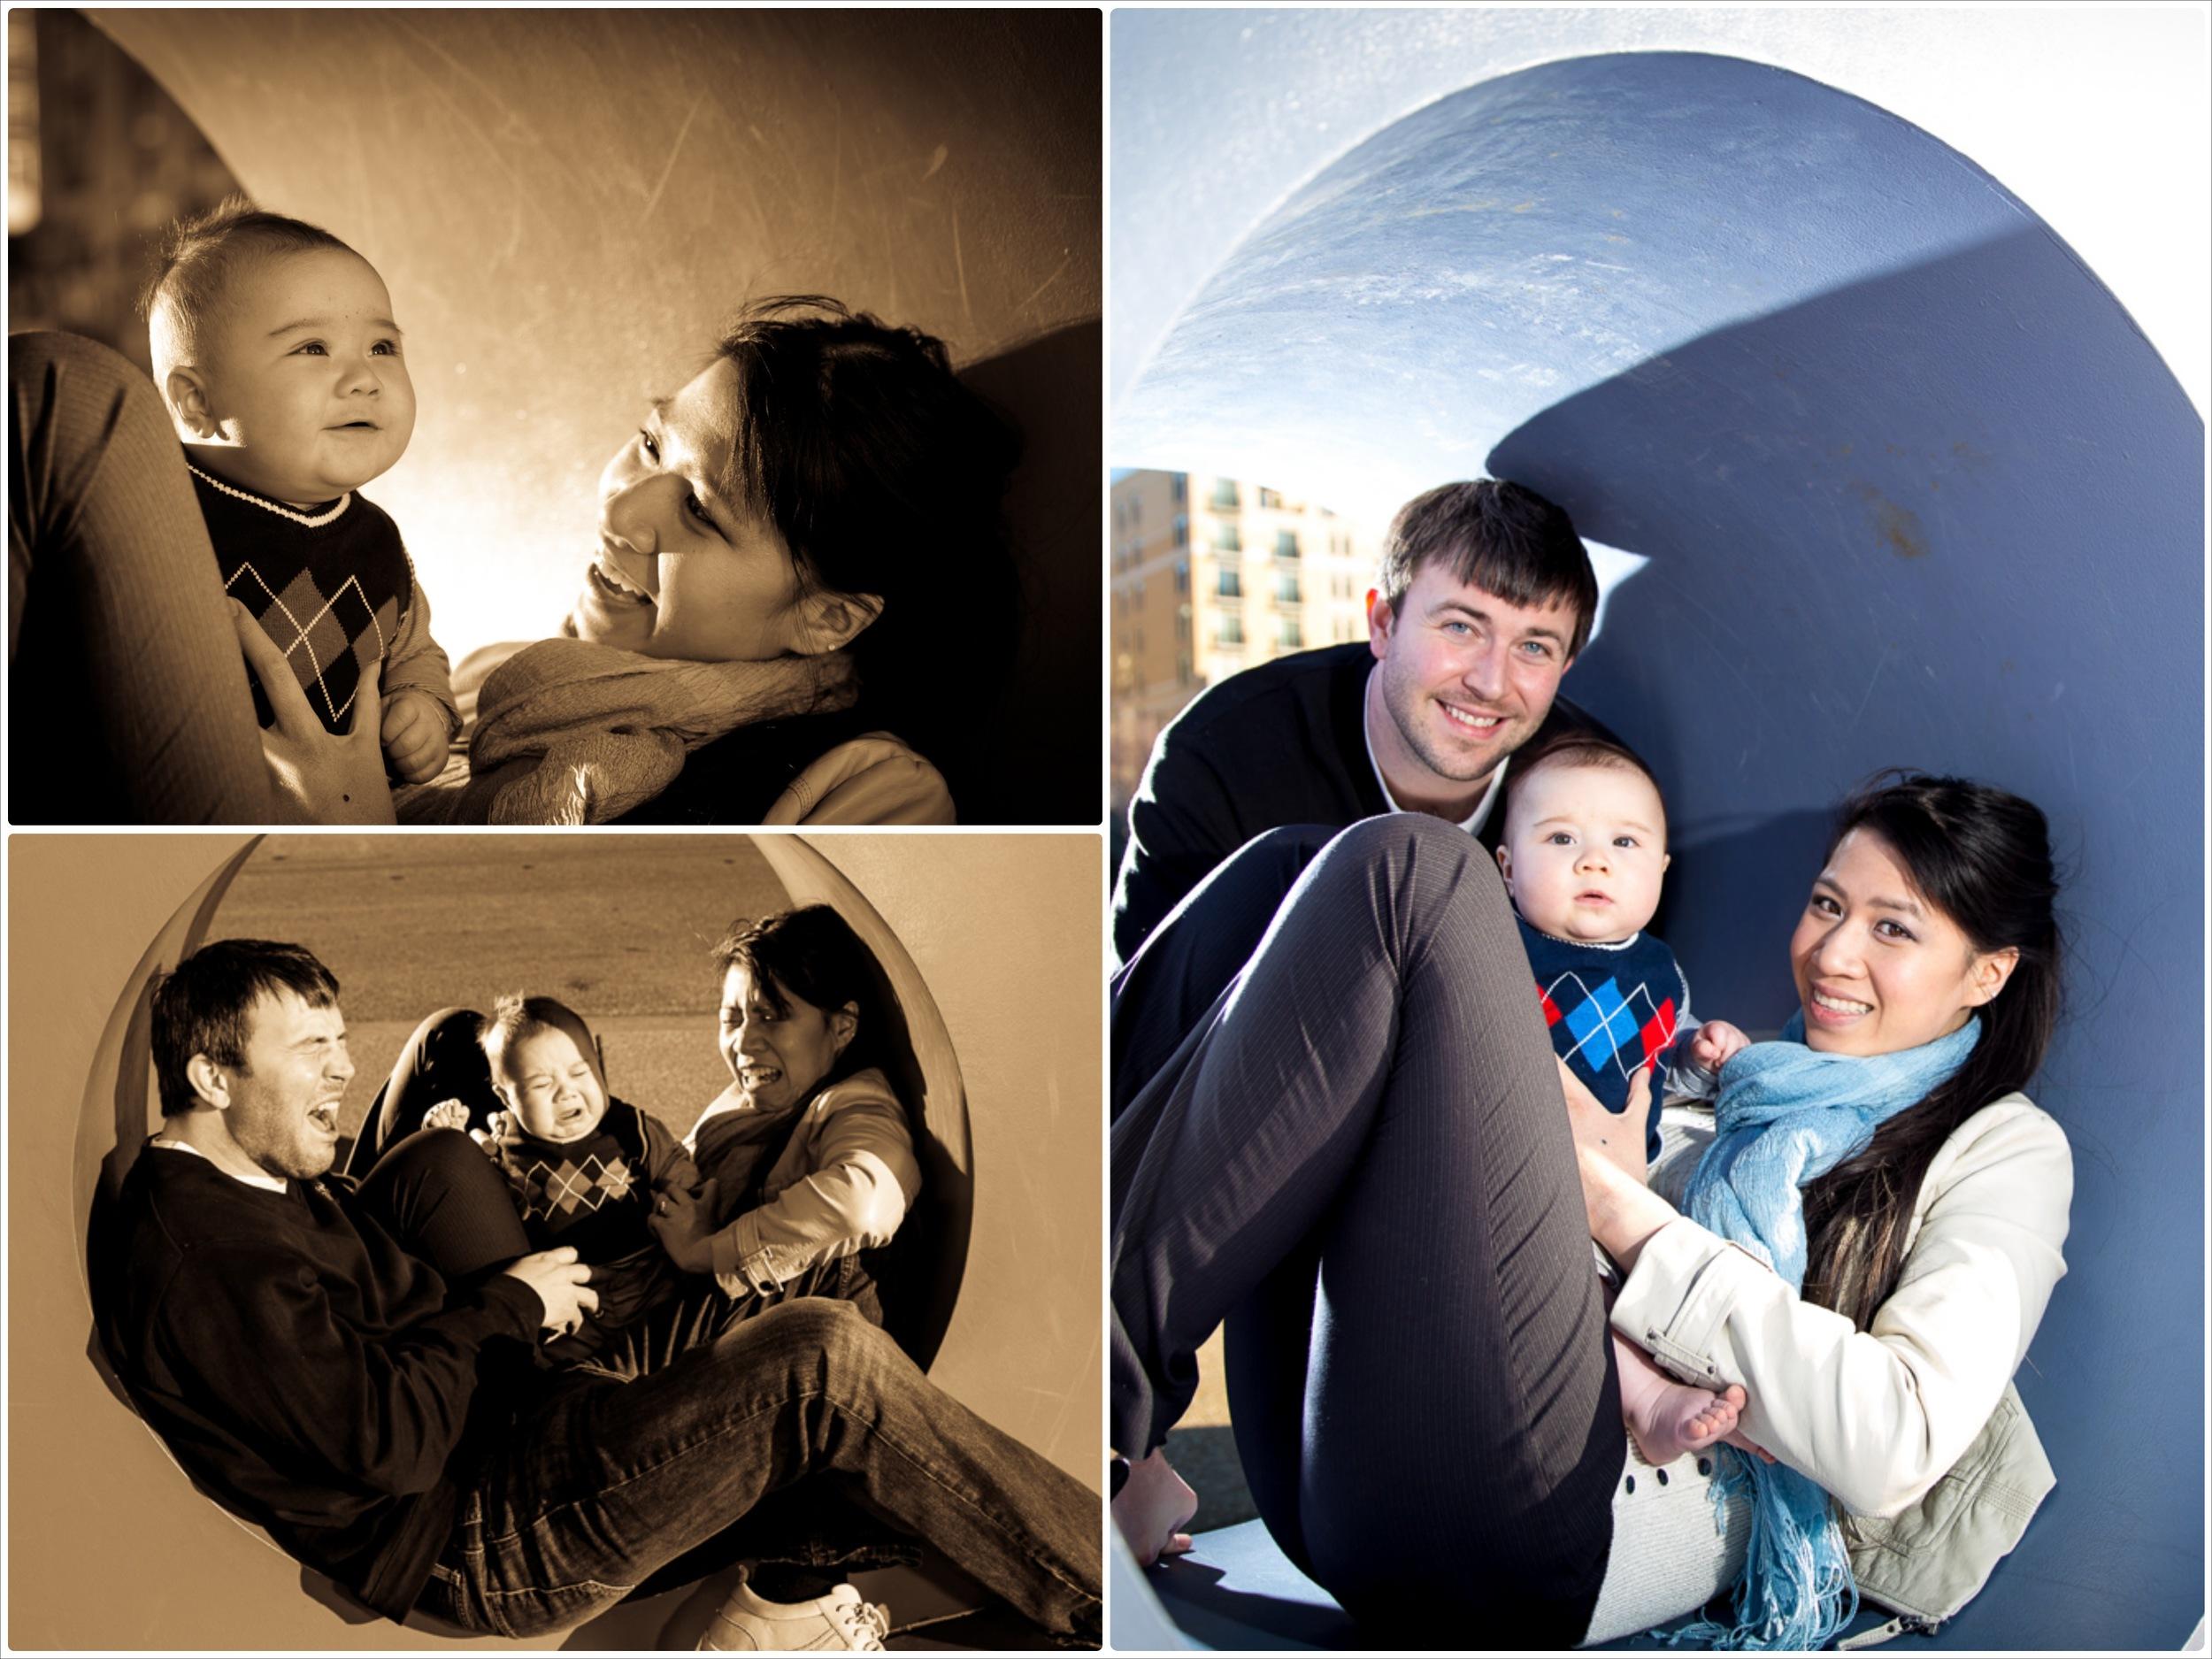 Blake-March-2014-Collage-10.jpg